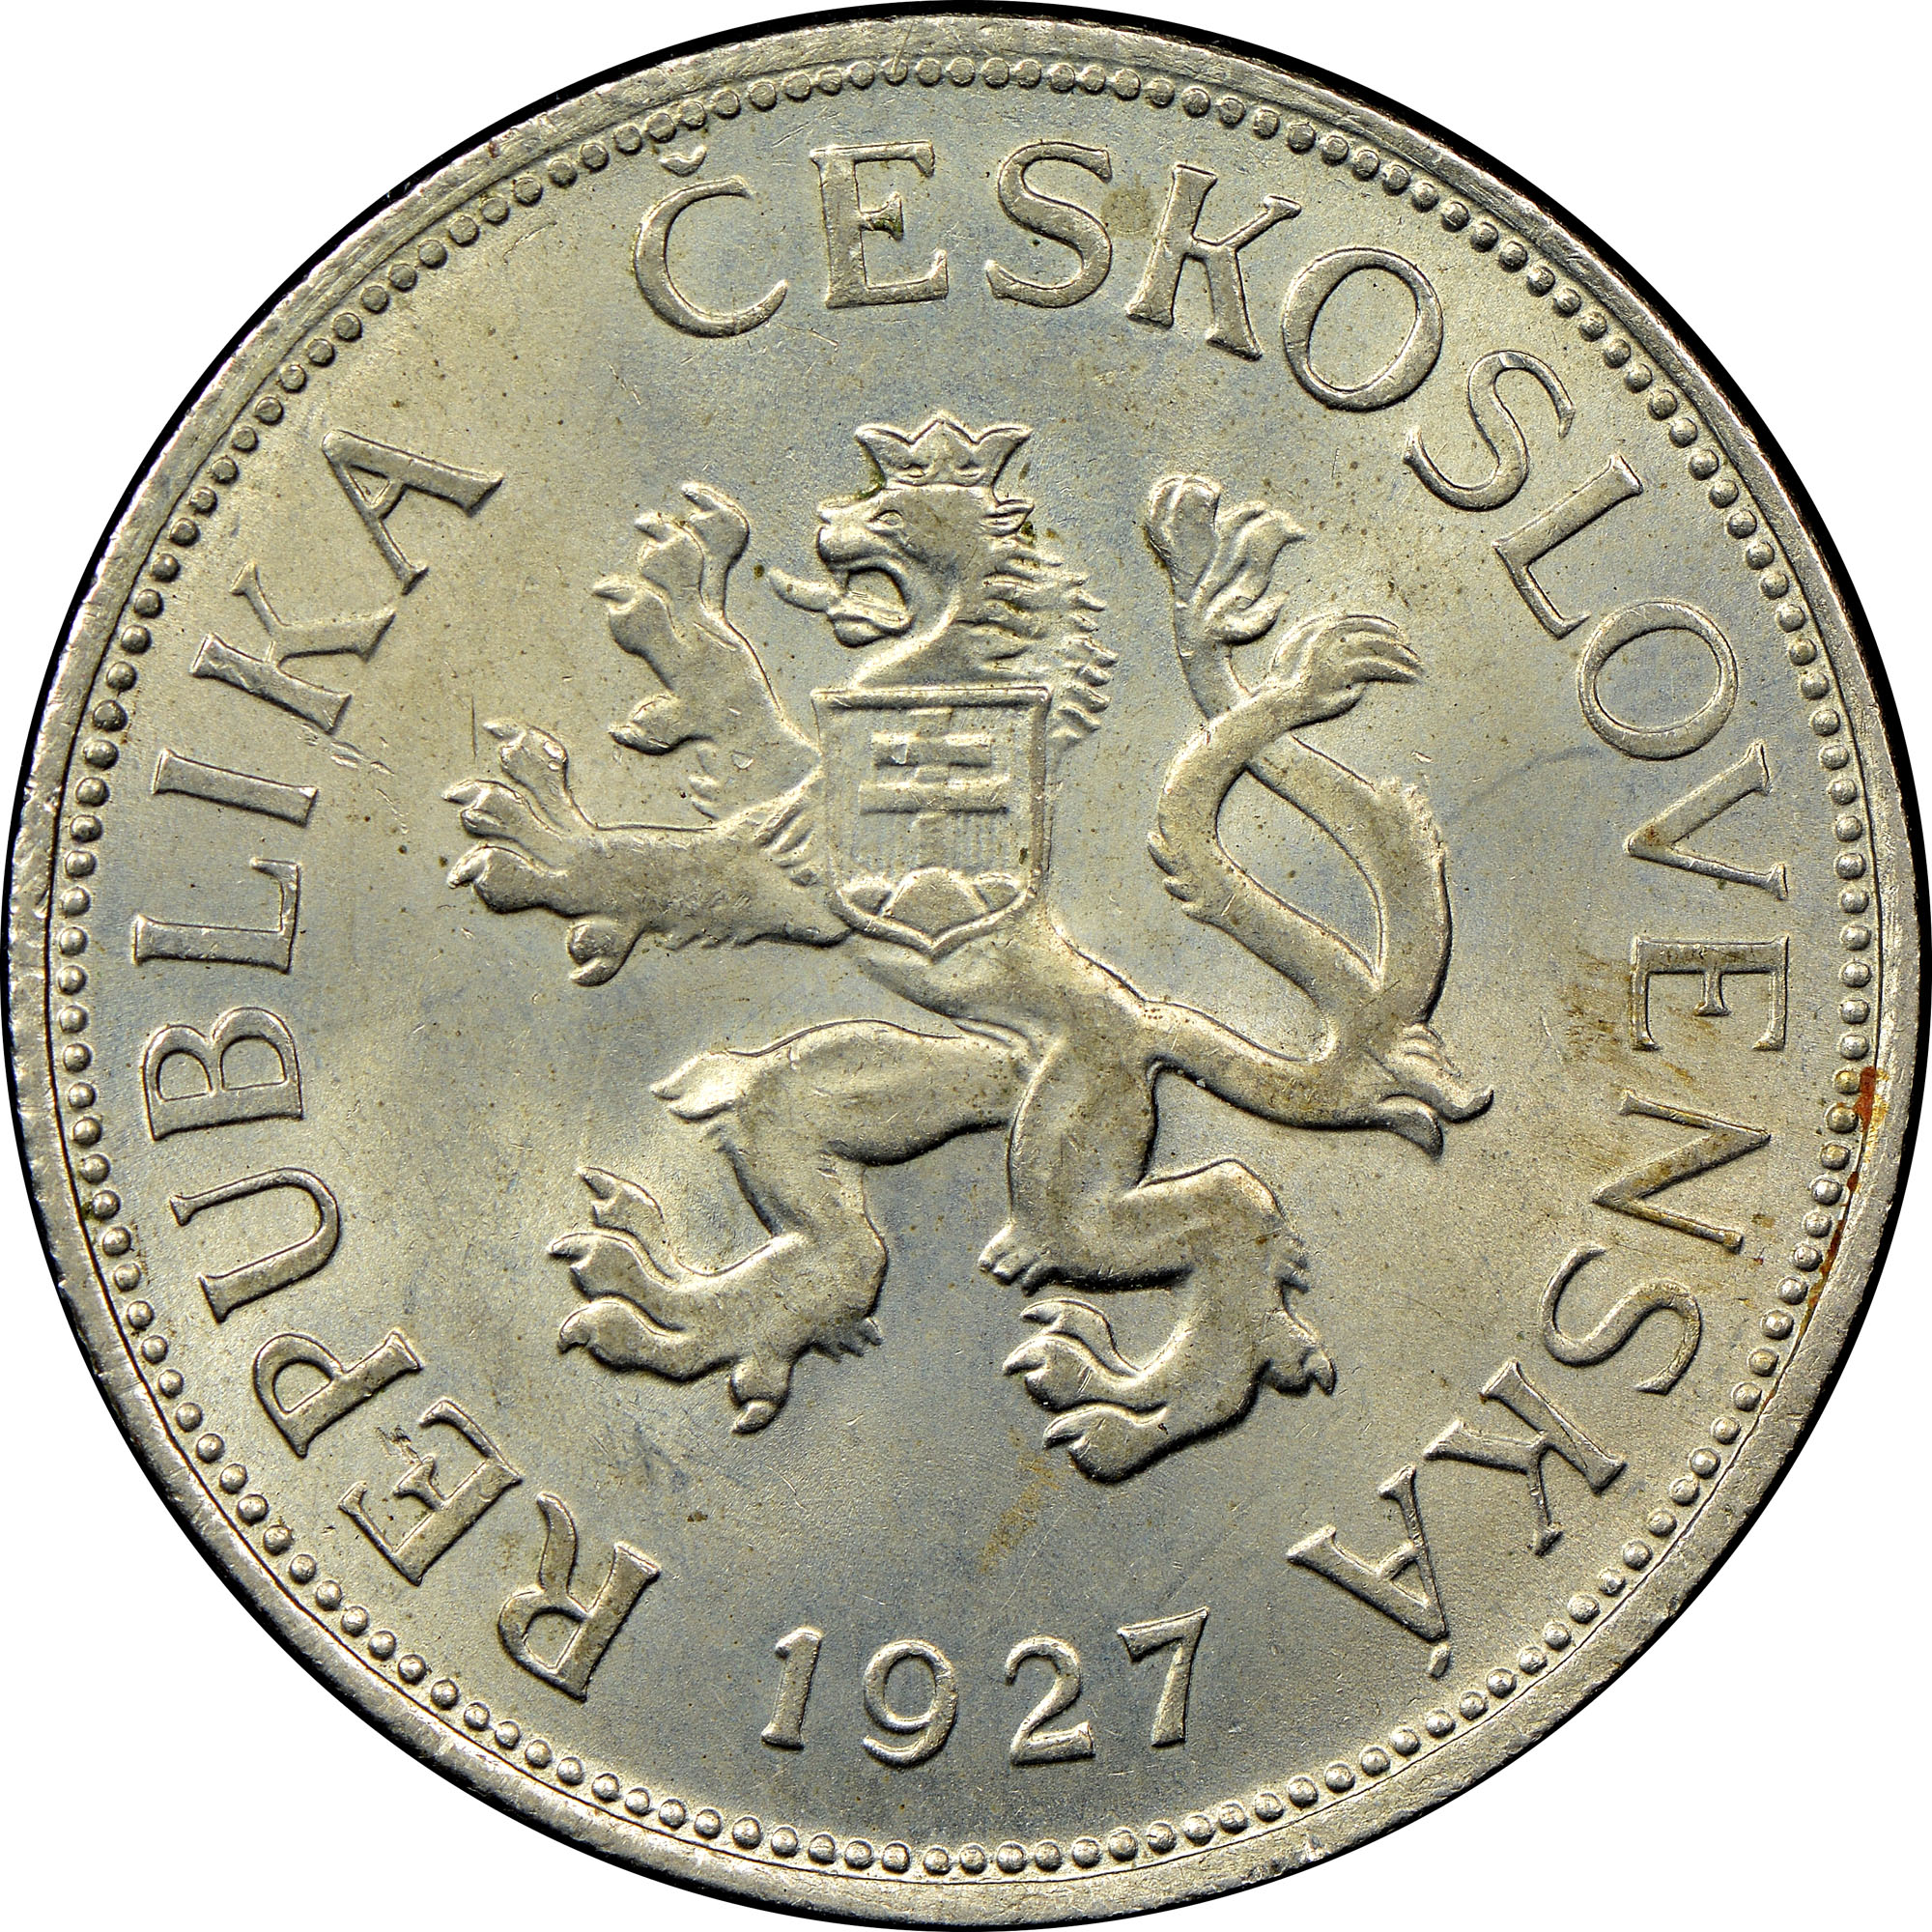 1925-1927 Czechoslovakia 5 Korun obverse